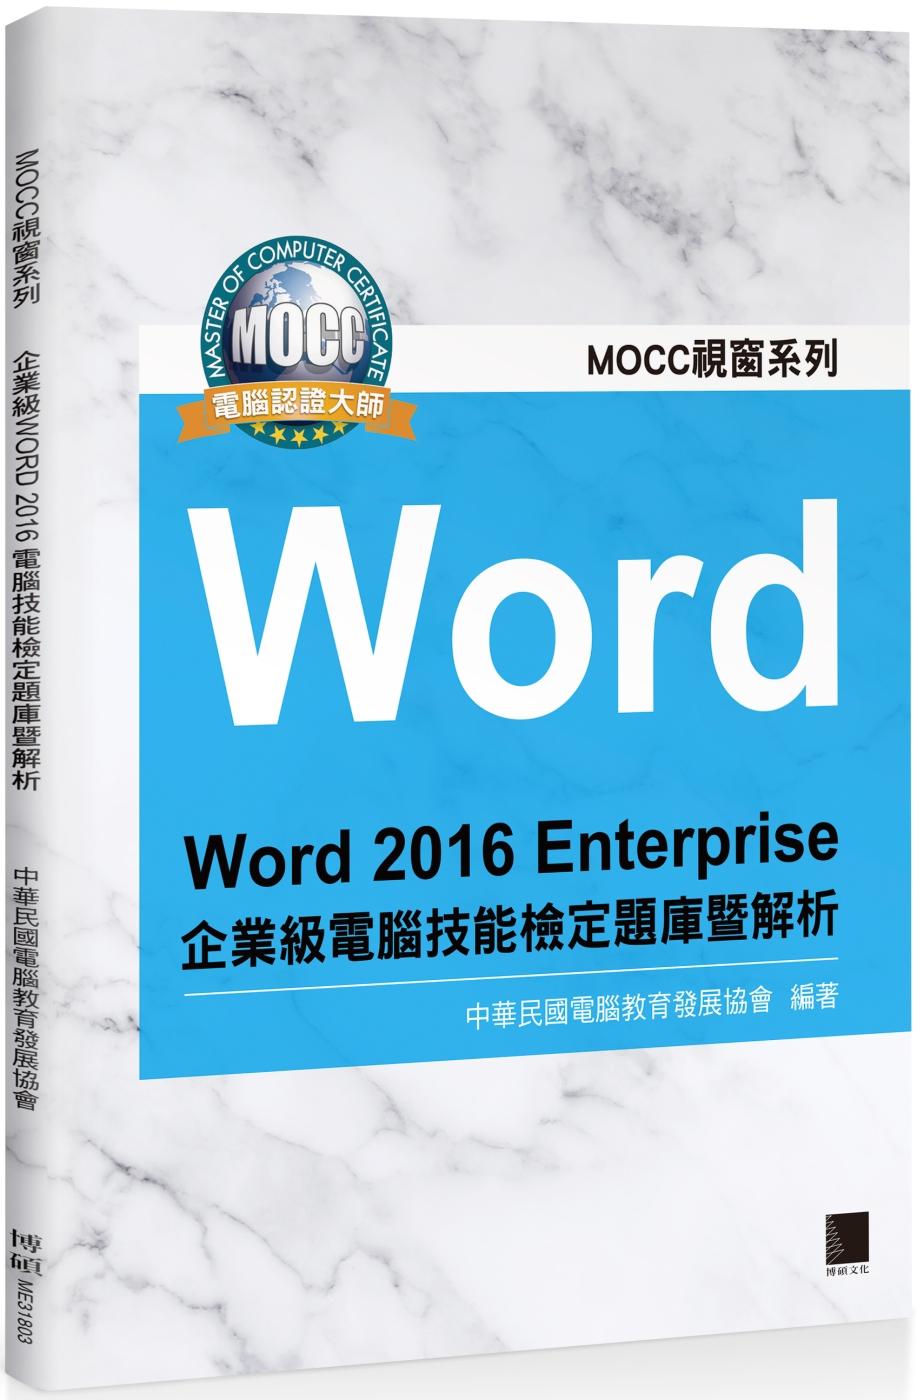 Word 2016 Enterprise 企業級電腦技能檢定題庫暨